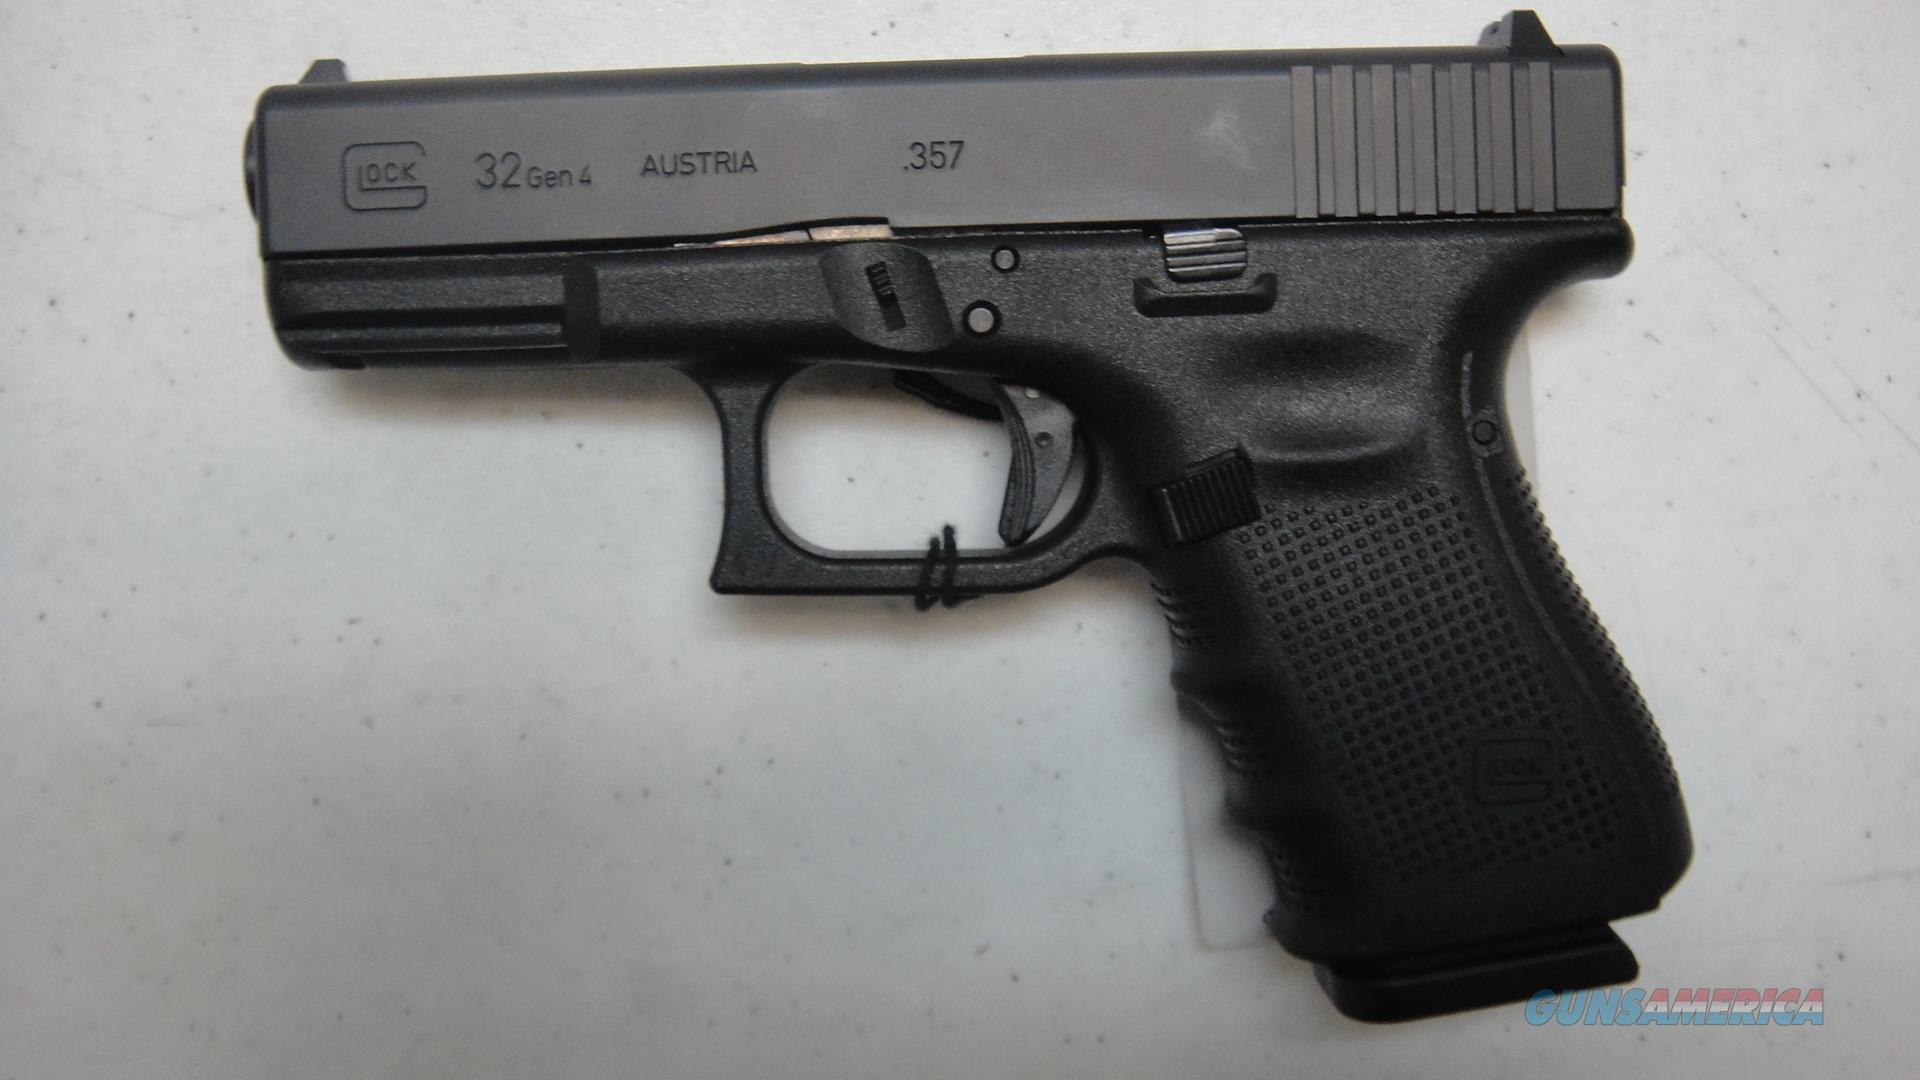 Glock 32 Gen4  Guns > Pistols > Glock Pistols > 31/32/33